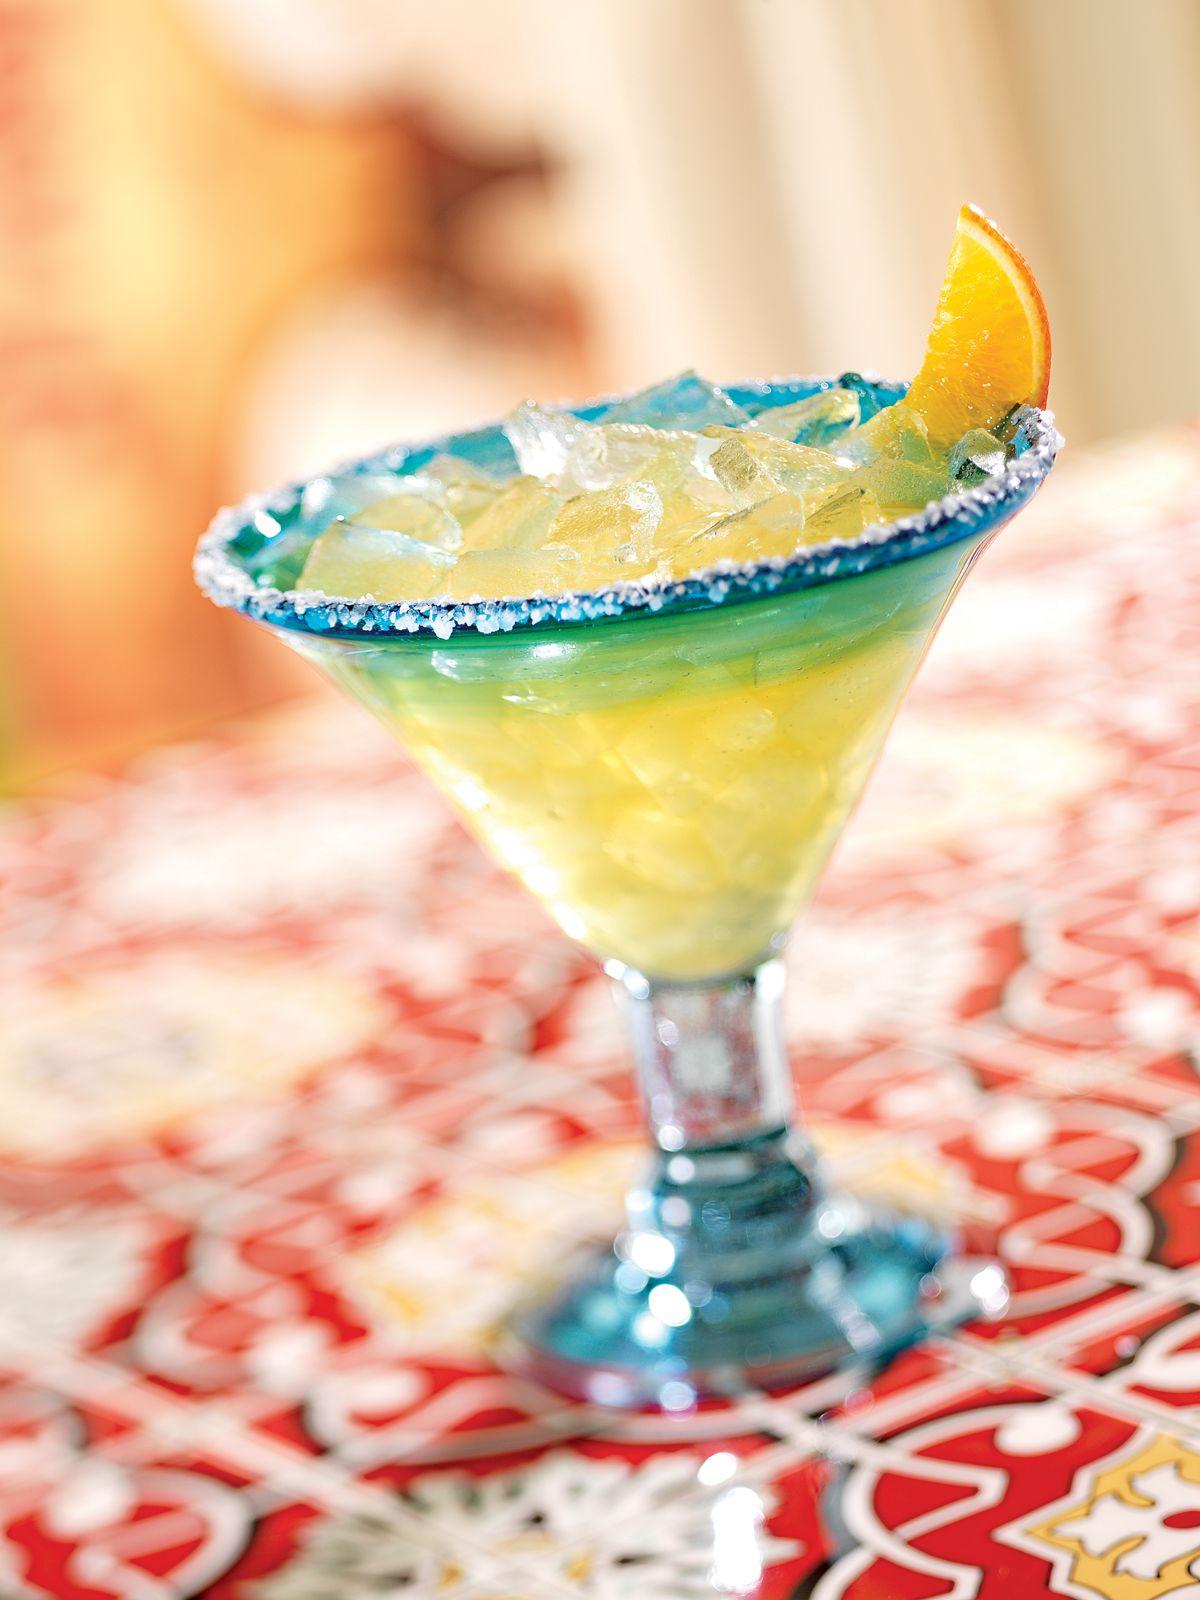 El Nino Margarita: Herradura Reposado Tequila 100% Blue Agave, Gran Gala, Patron Citronge Premium Orange Liqeur and orange juice.